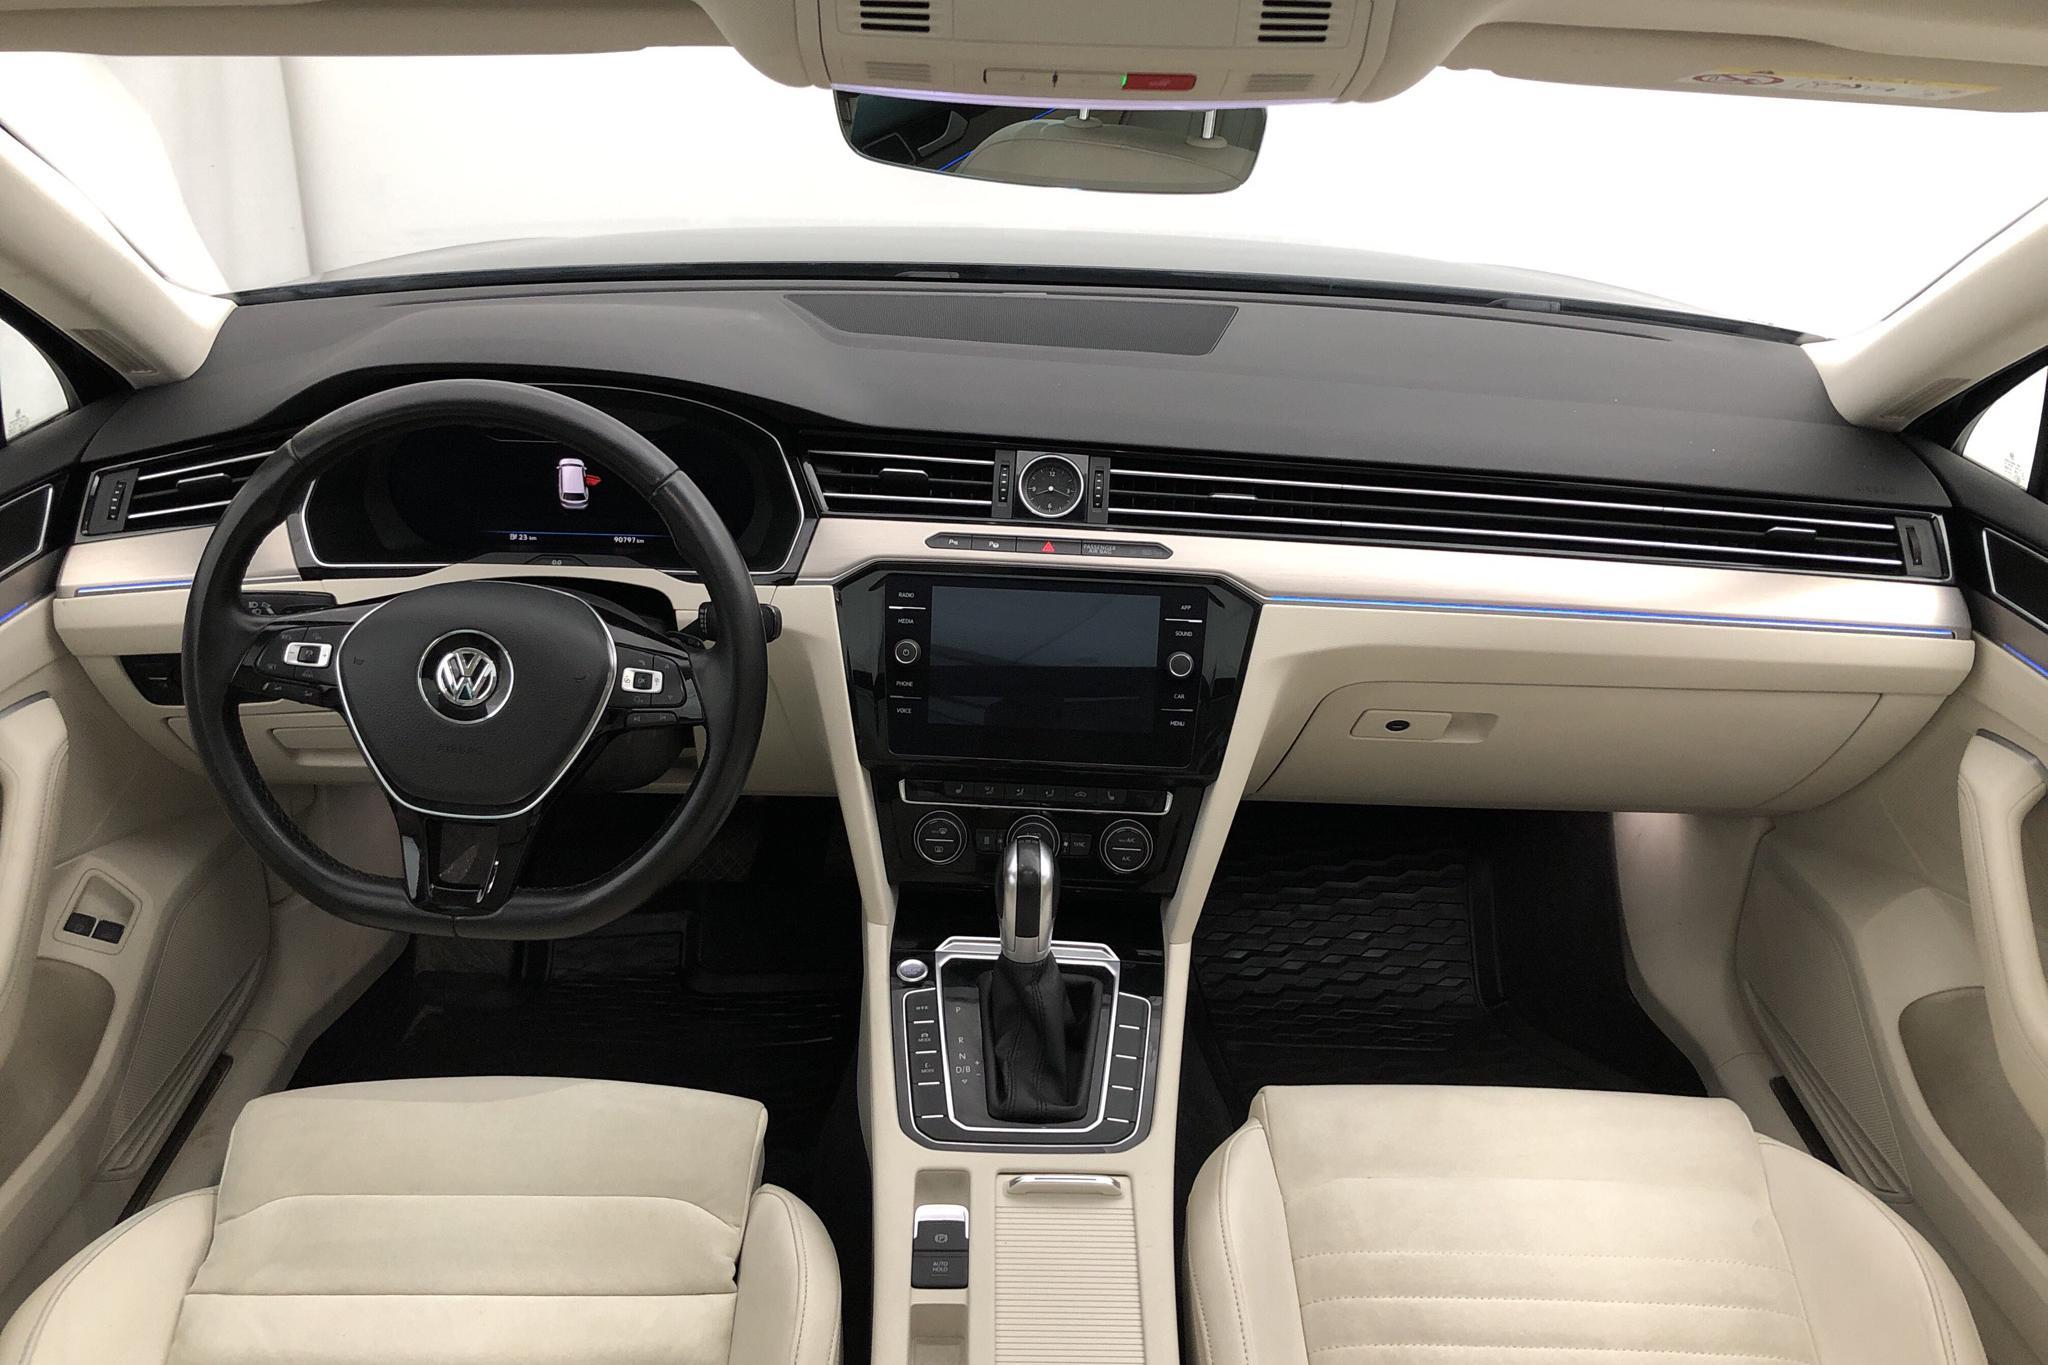 VW Passat 1.4 Plug-in-Hybrid Sportscombi (218hk) - 90 790 km - Automatic - Dark Grey - 2018